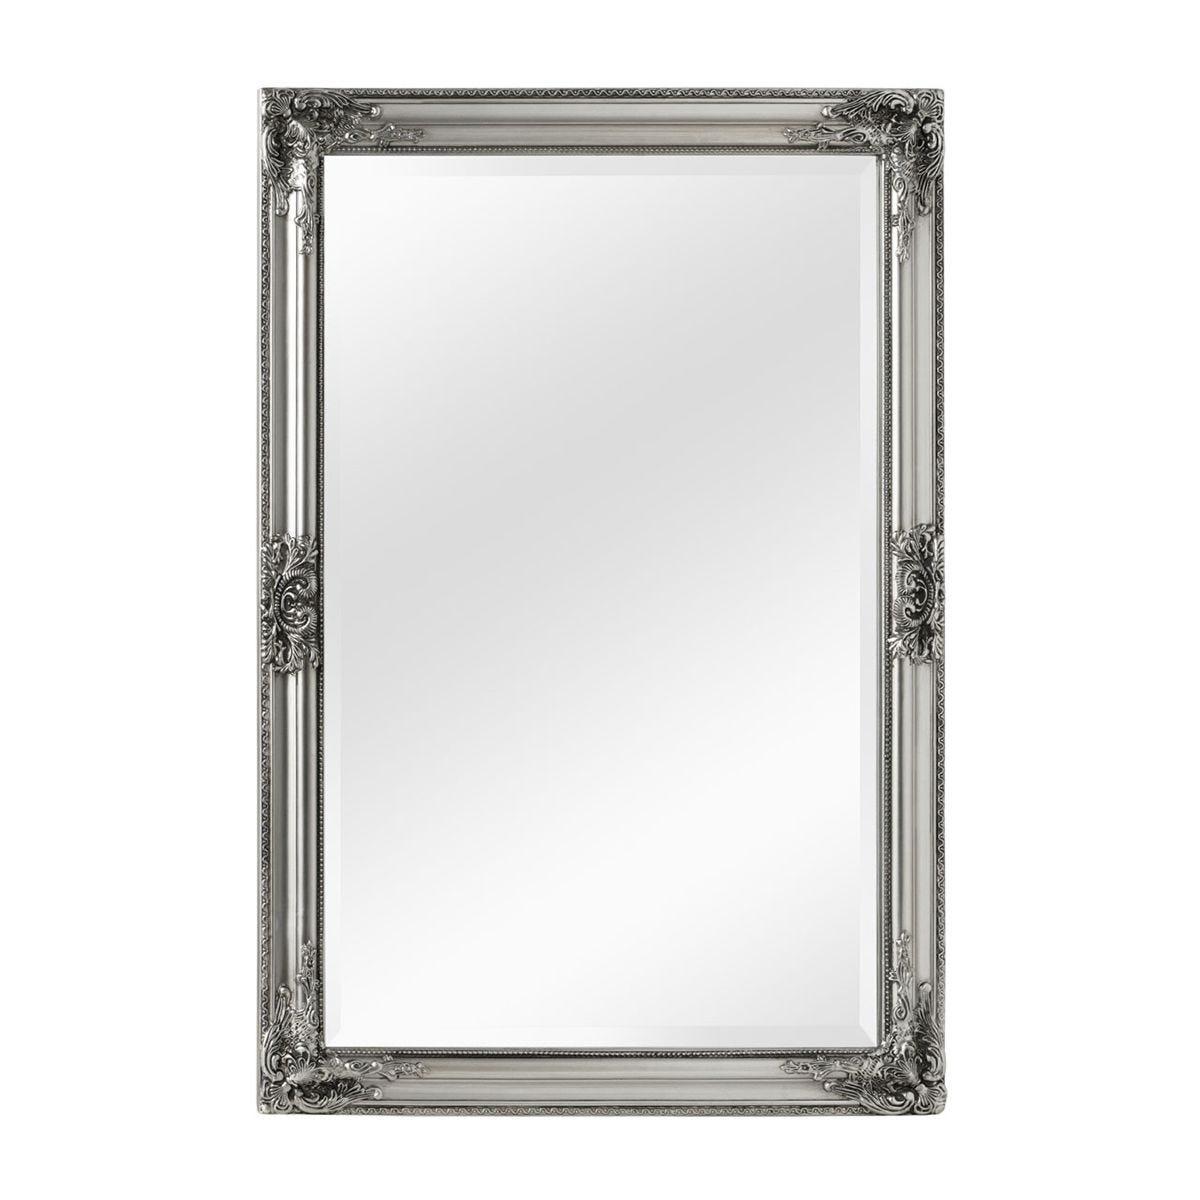 Premier Housewares Rustic Vintage Mirror - Silver